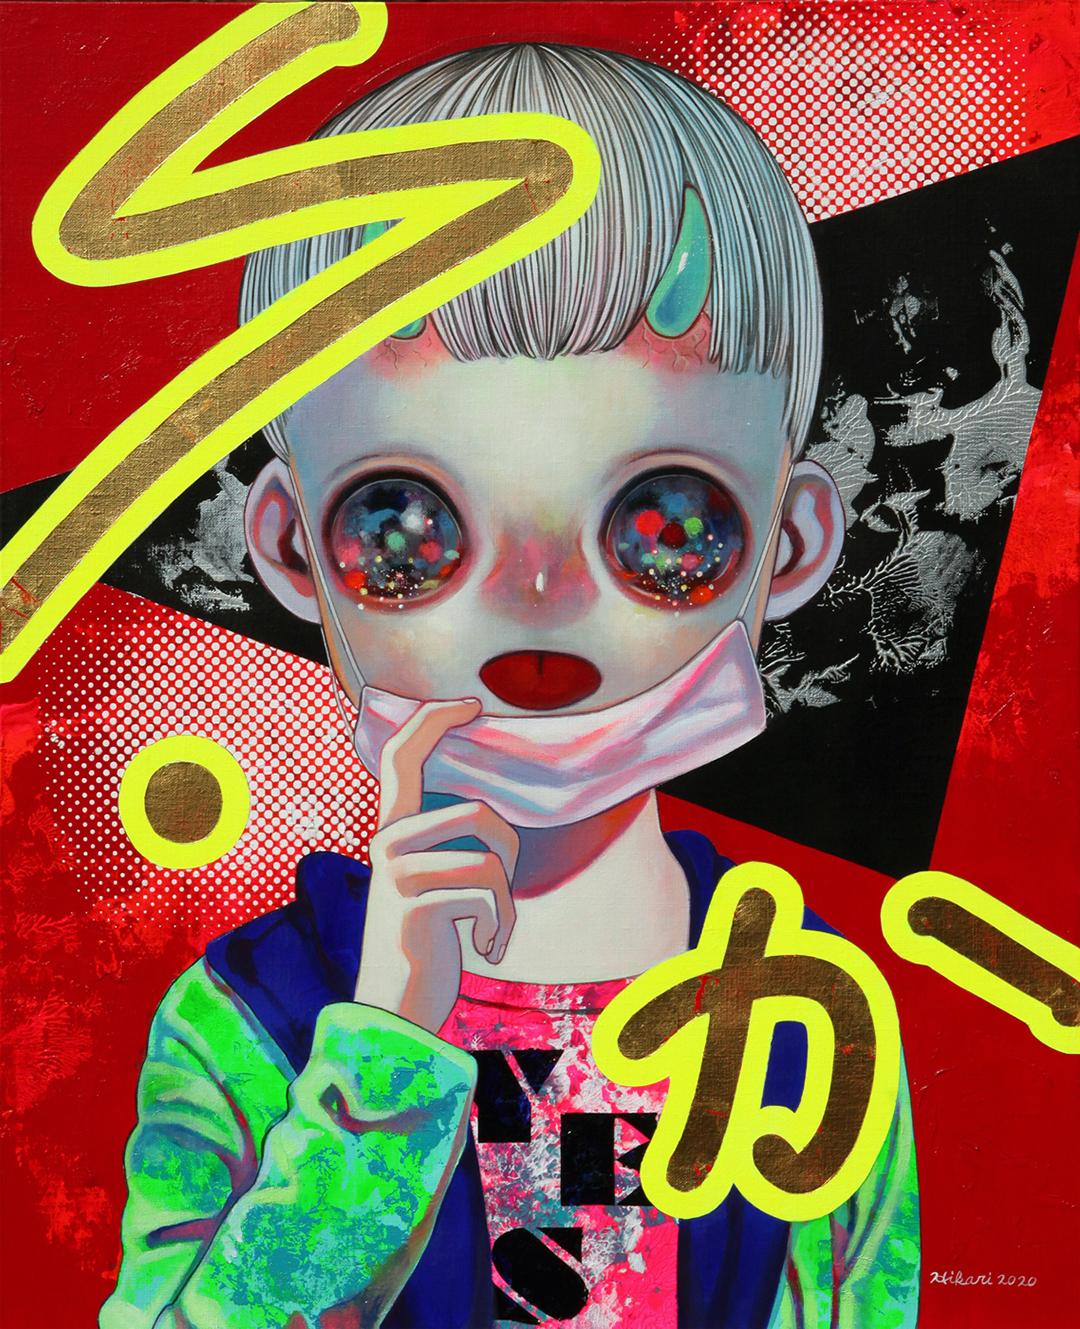 GirlsclubAsia-Artist-Hikari Shimoda_People with Intentions #2_Acrylic, oil, gold leaf on canvas_25.7 x 20.9